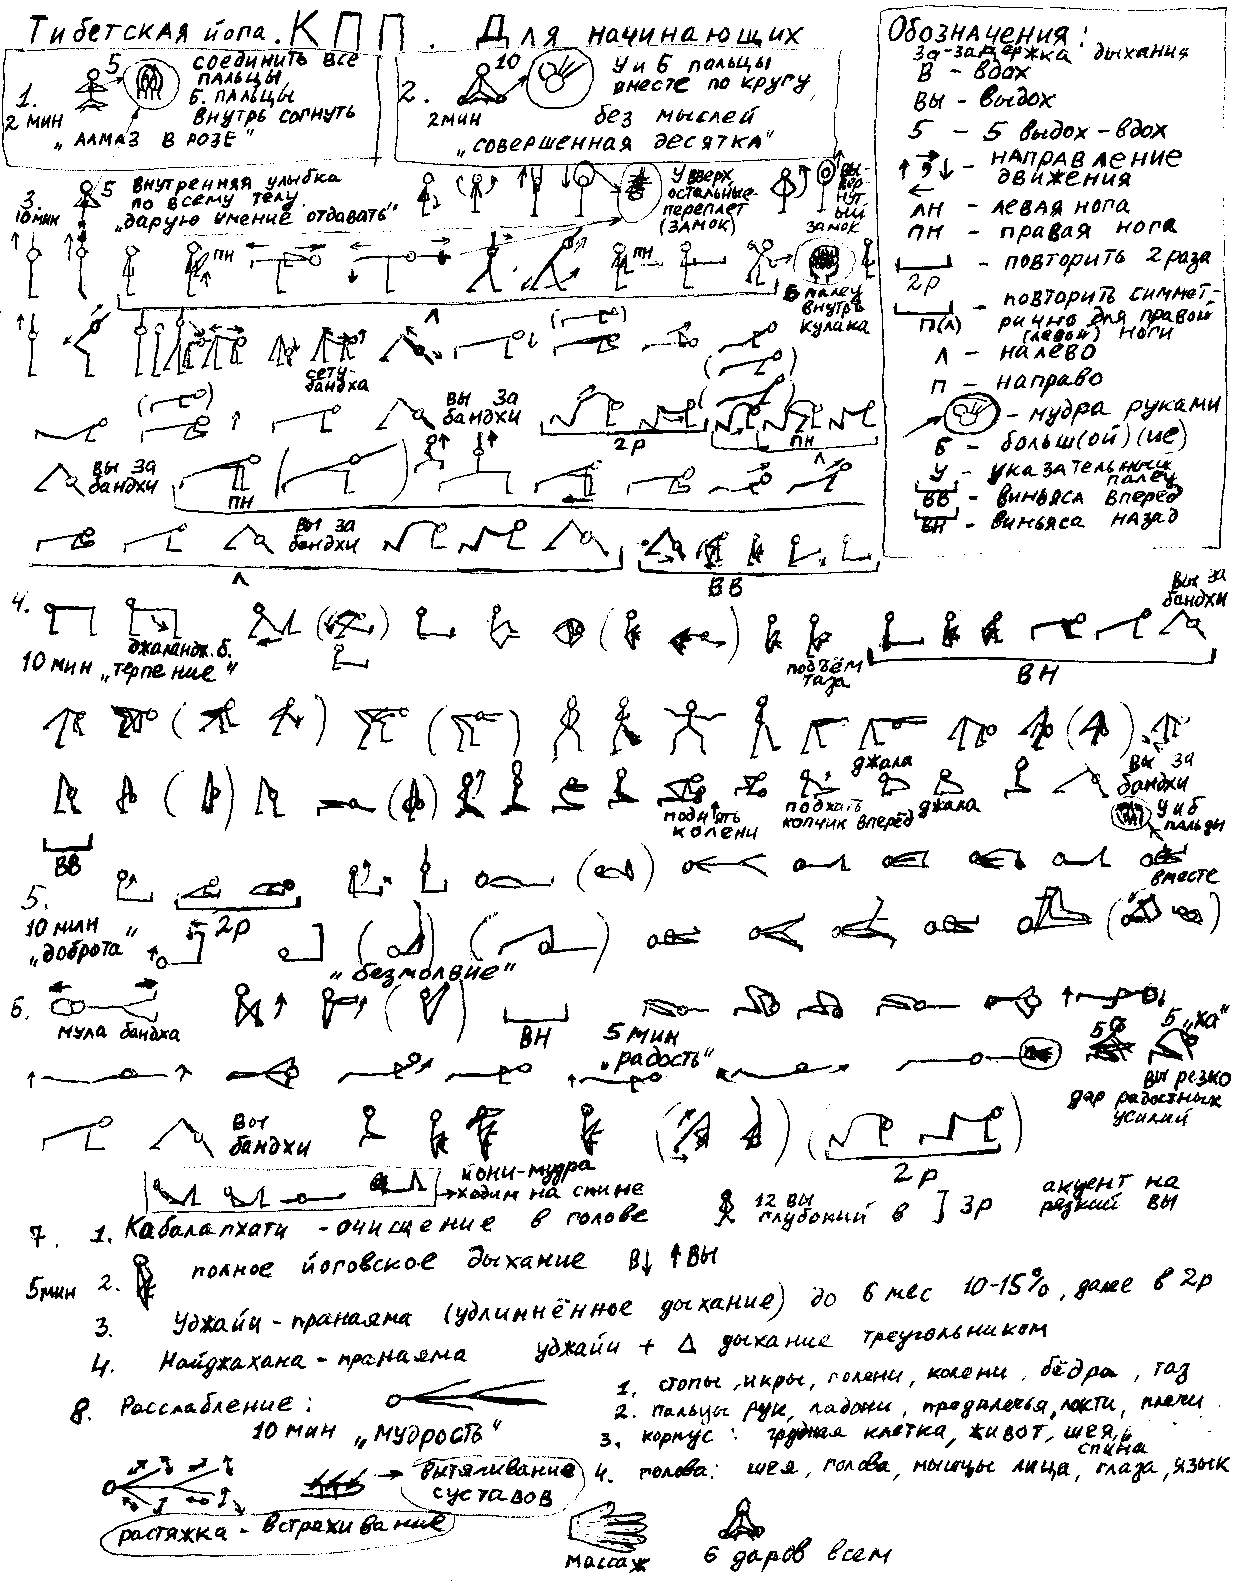 Технологический алгоритм тибетской